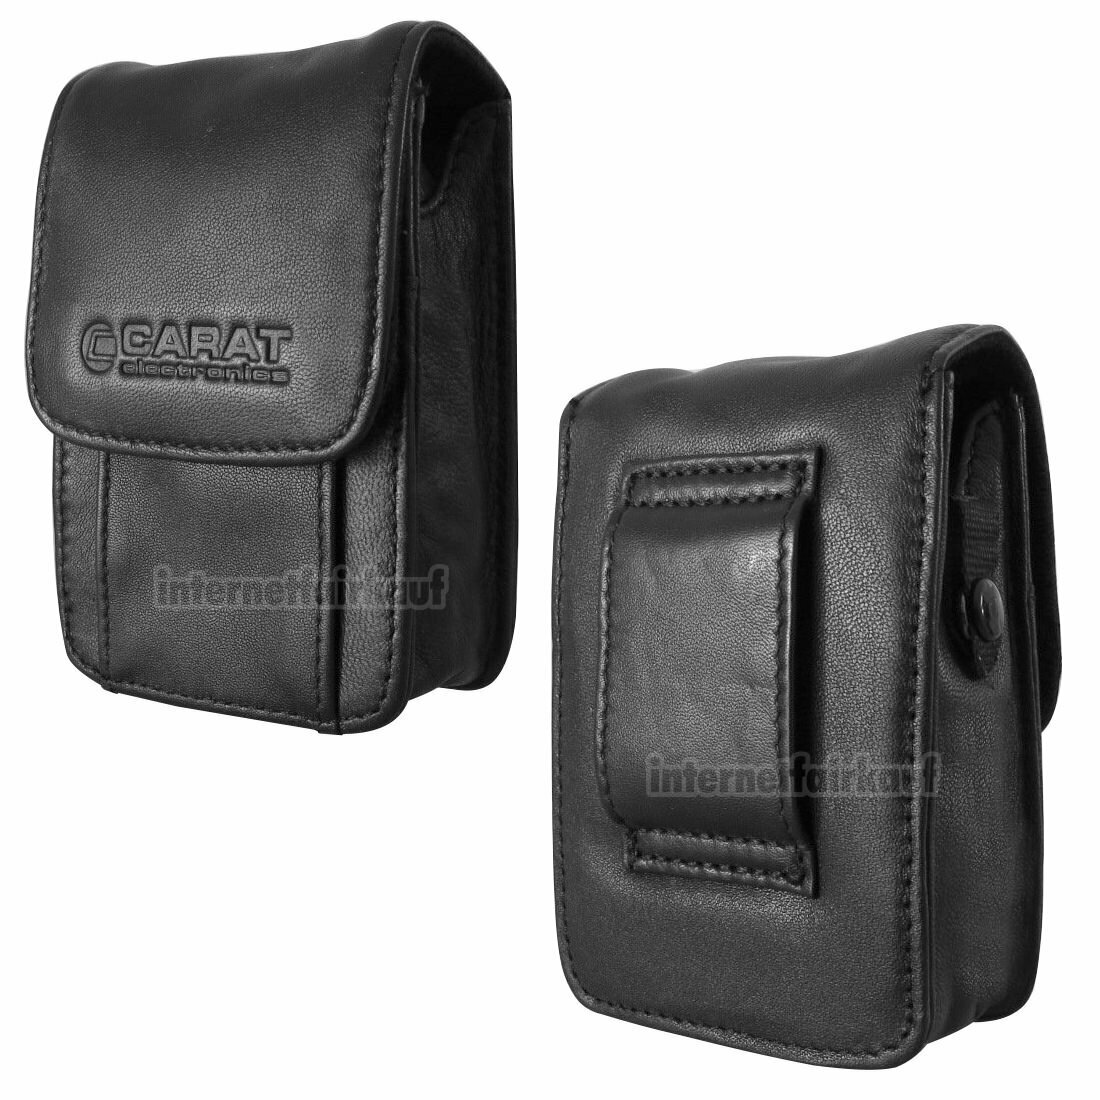 Gürteltasche Kameratasche passend für Panasonic Lumix DMC-SZ10 DMC-LF1